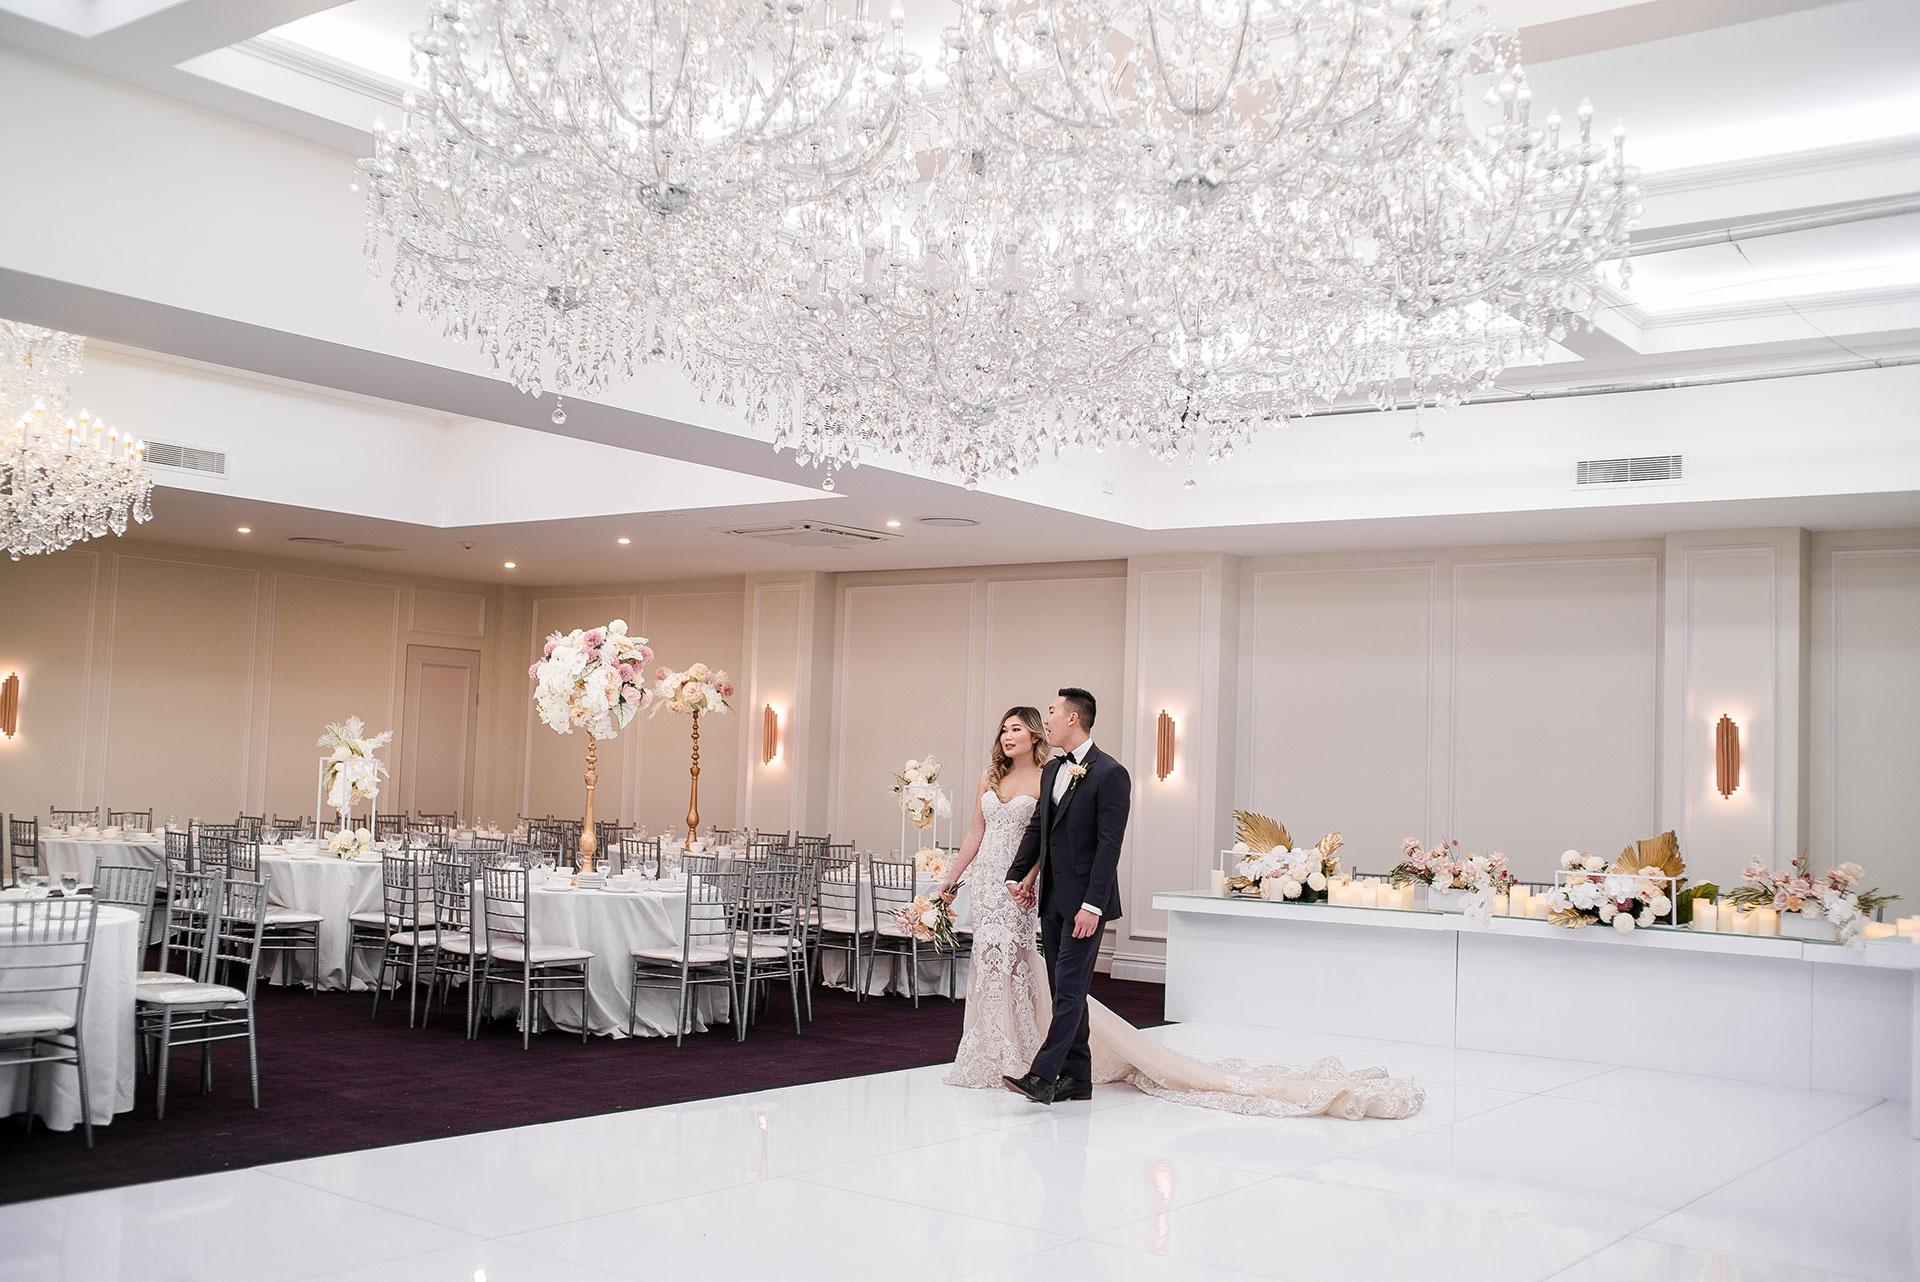 sydney-chinese-wedding-venue.jpg